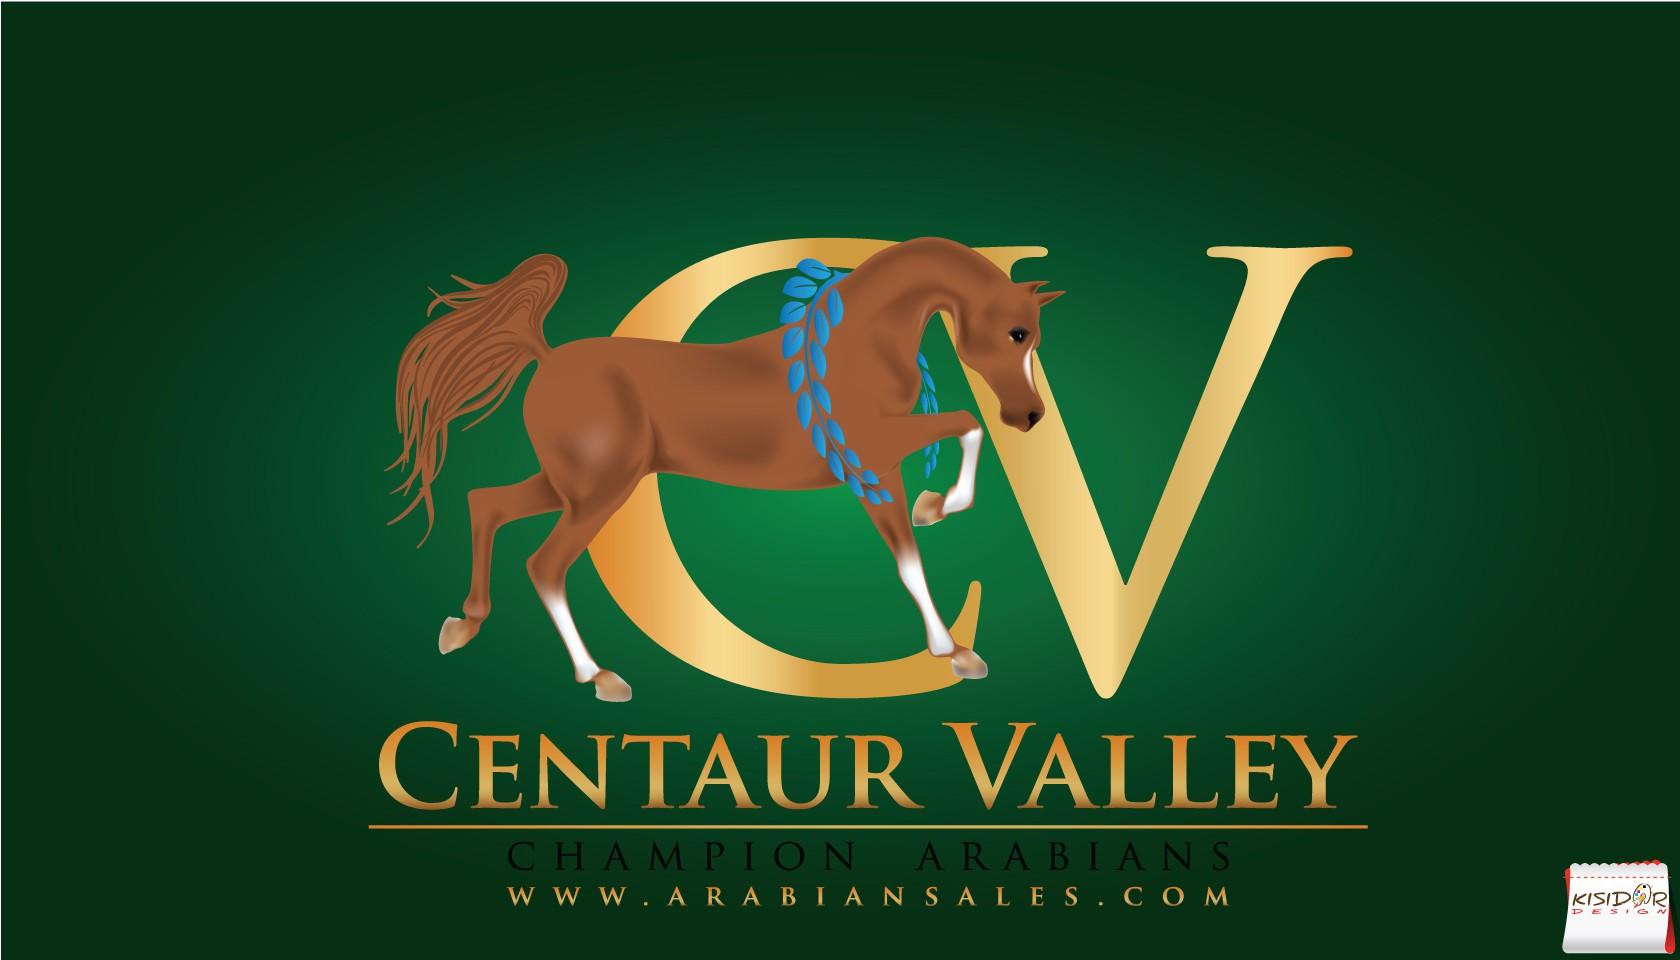 New logo wanted for CV (Centaur Valley Arabians)